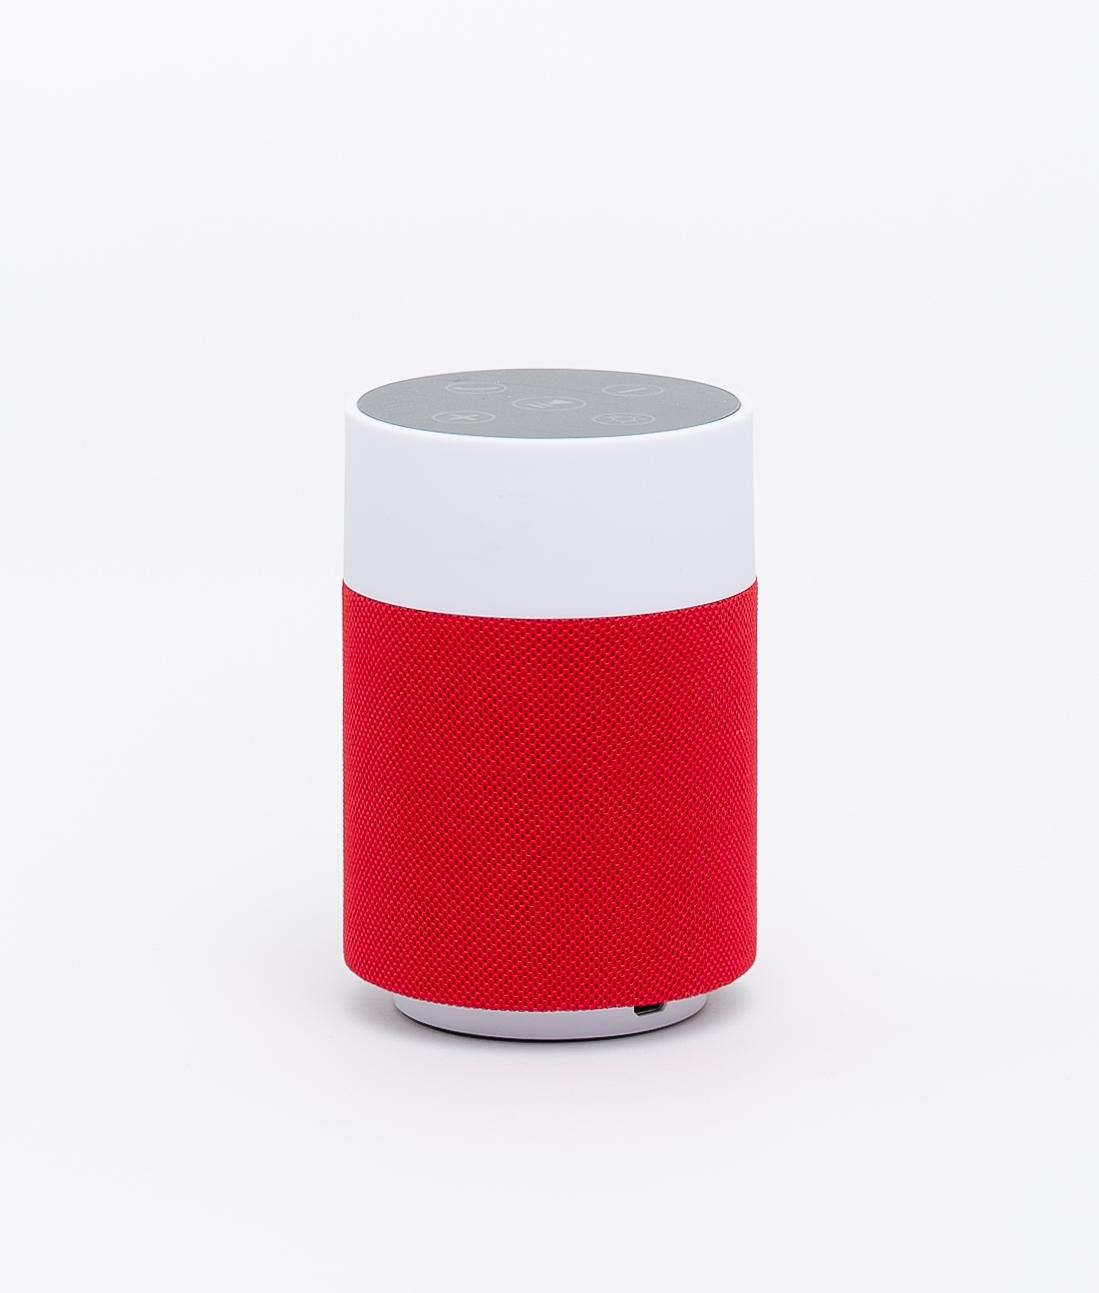 Altavoz Bluetooth Abacus - Rojo